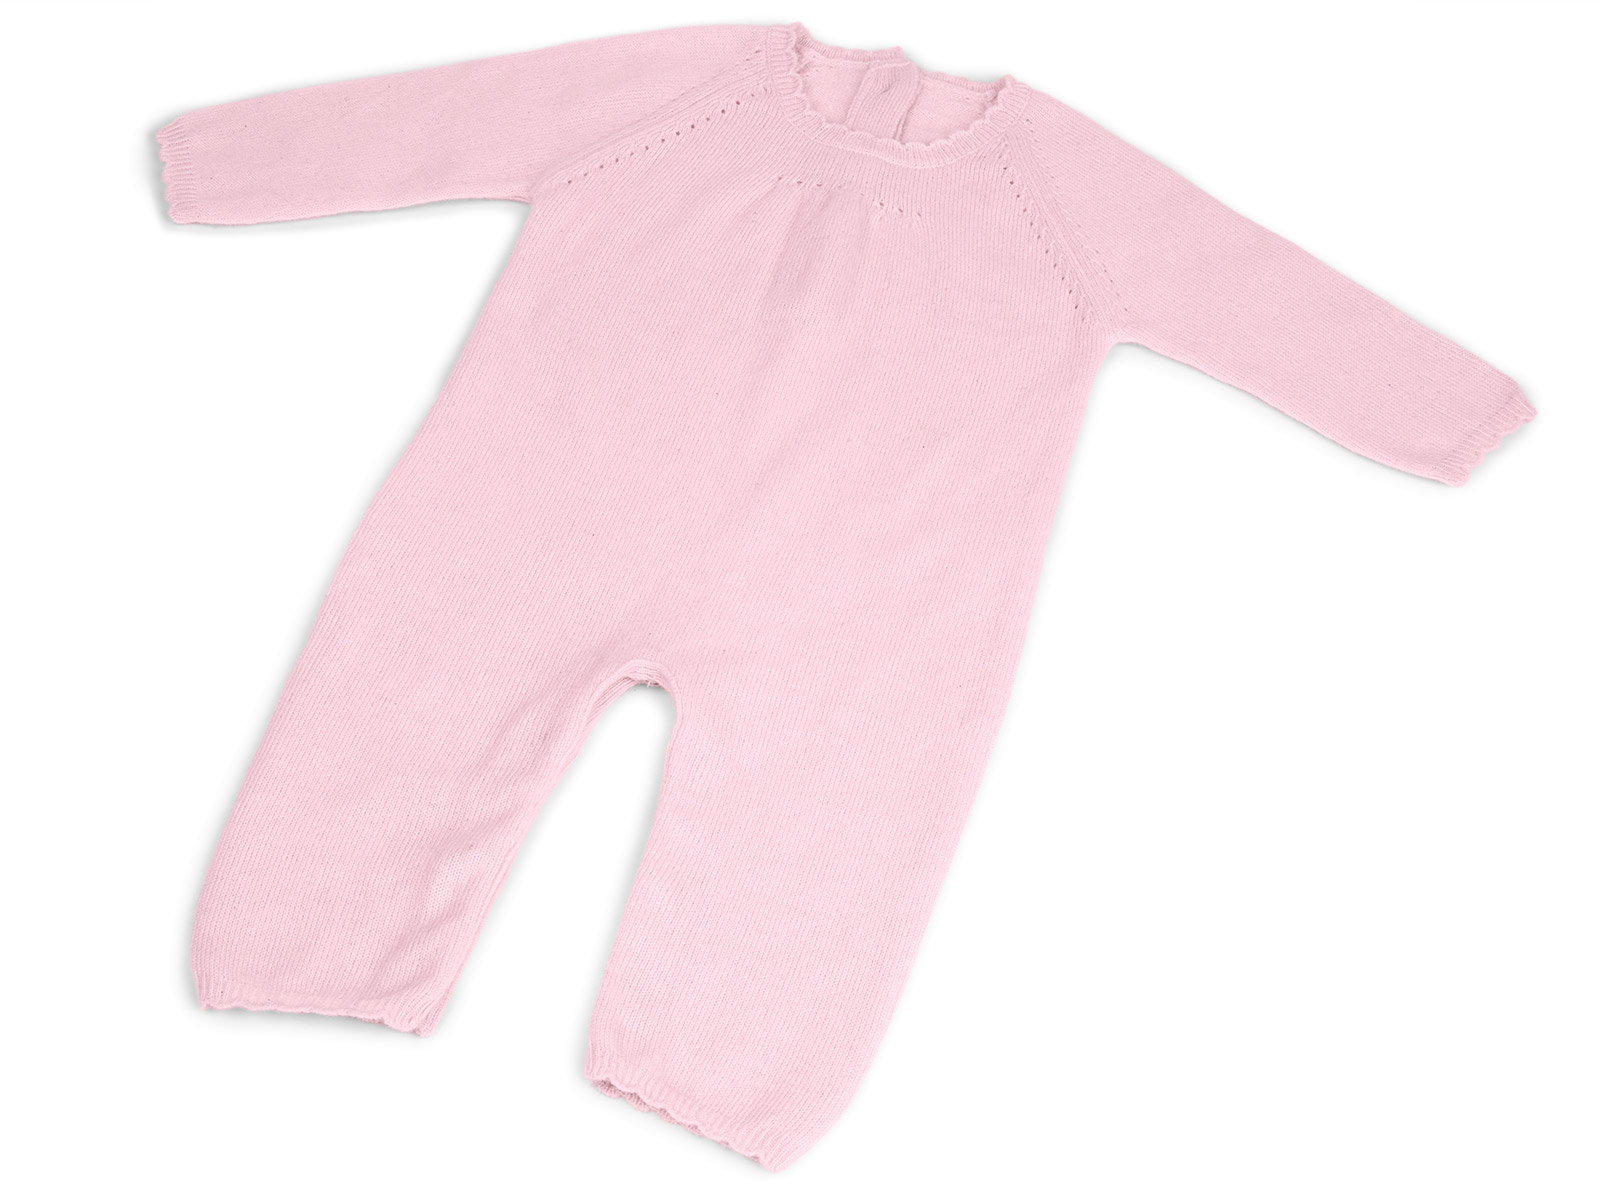 Baby_Onesie-Jamboree-Pink_5901.jpg